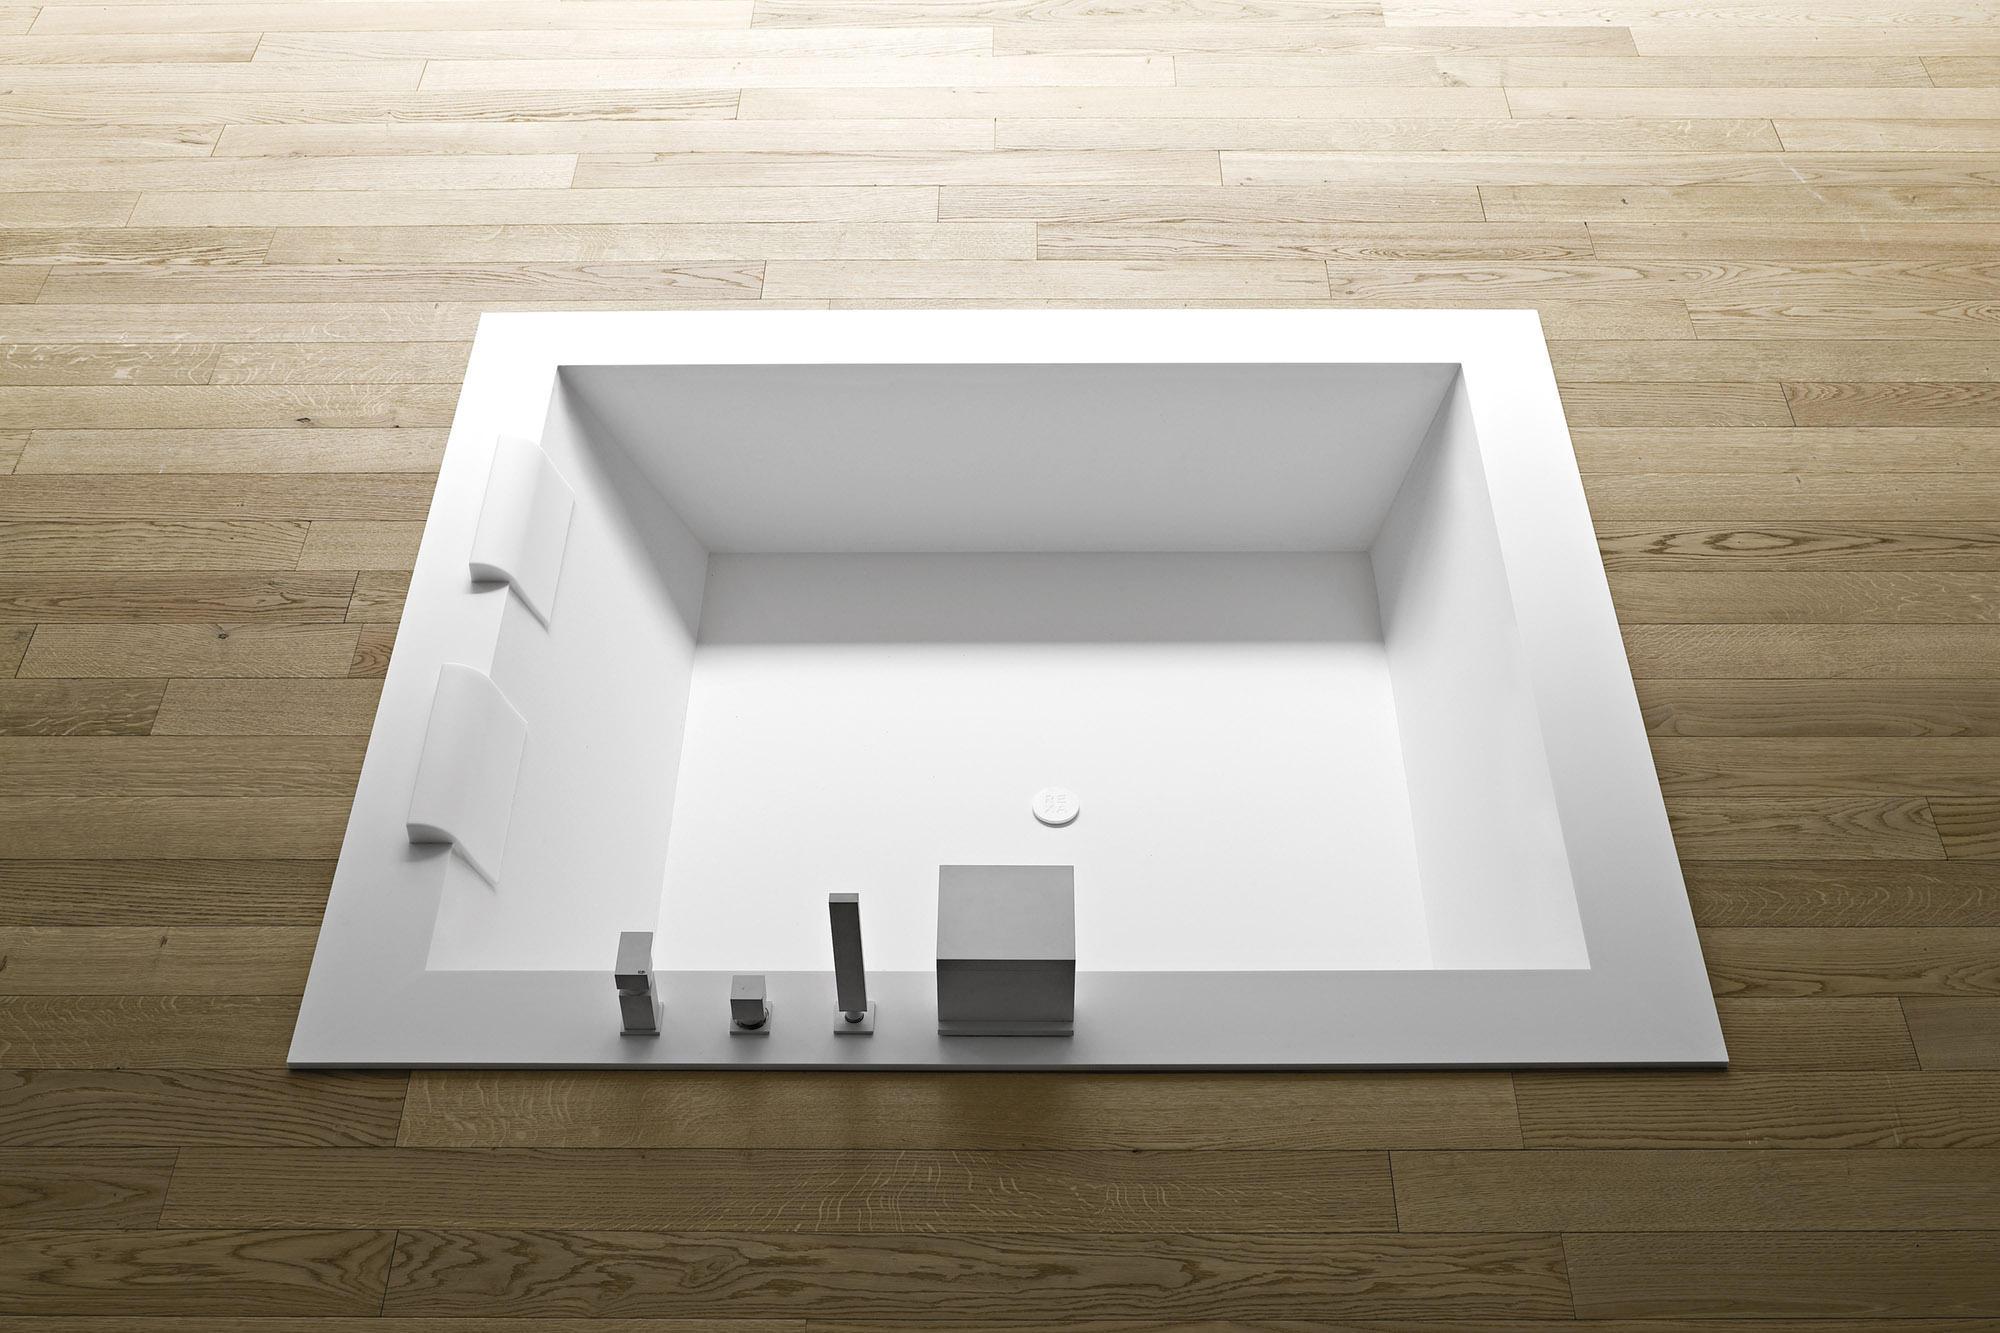 Unico maxi icasso vasche ad incasso rexa design architonic - Vasche da bagno a incasso ...